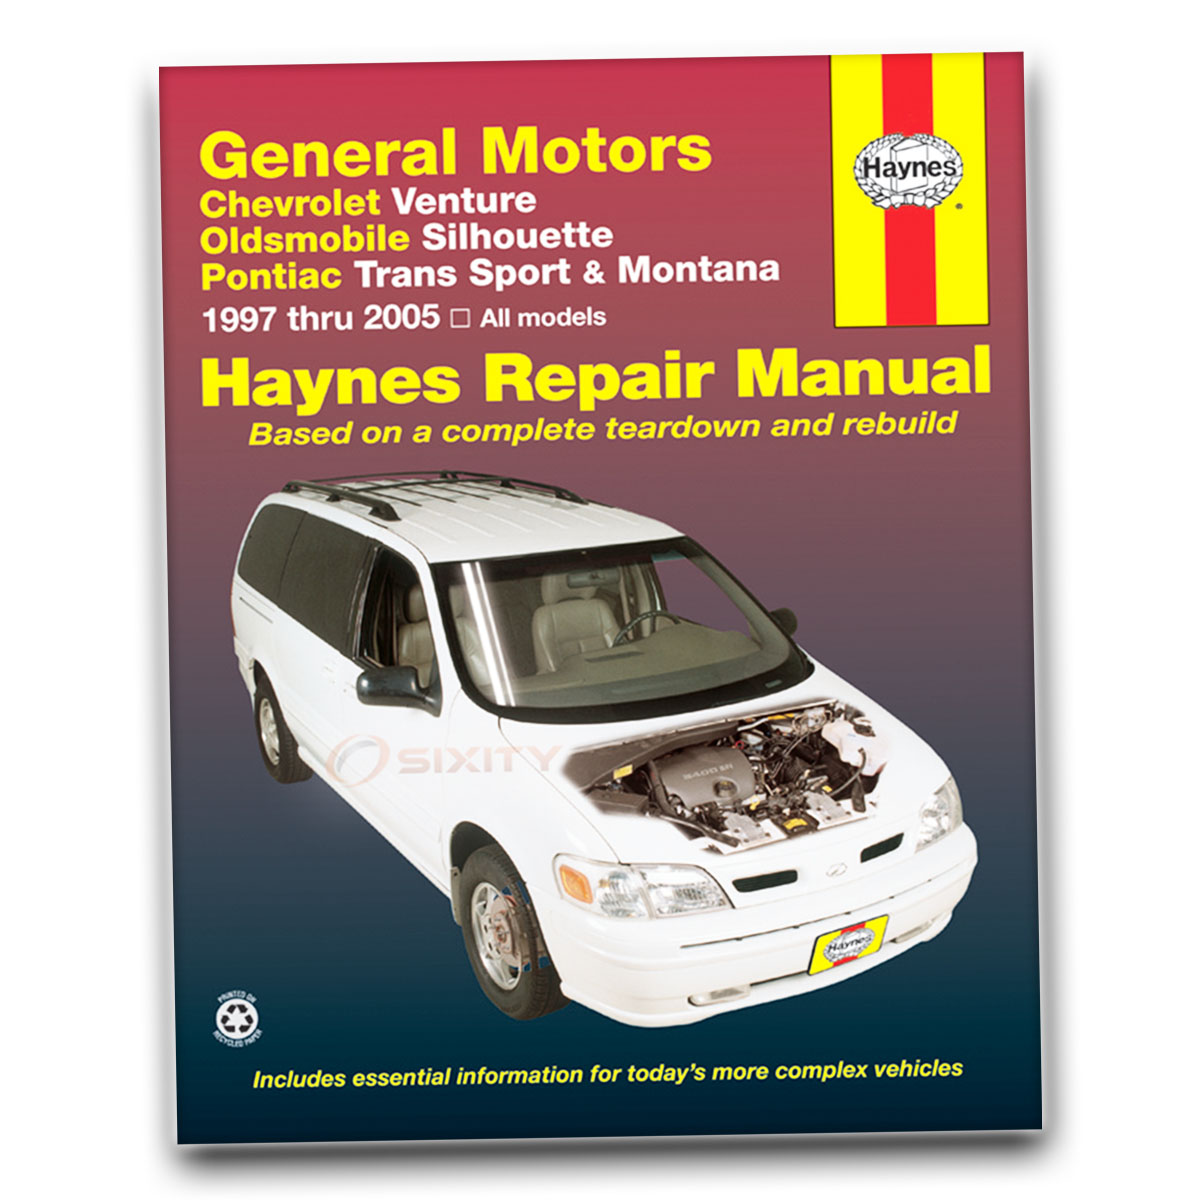 chevy venture haynes repair manual value warner bros plus ls base rh ebay com 2013 Chevy Venture 2013 Chevy Venture